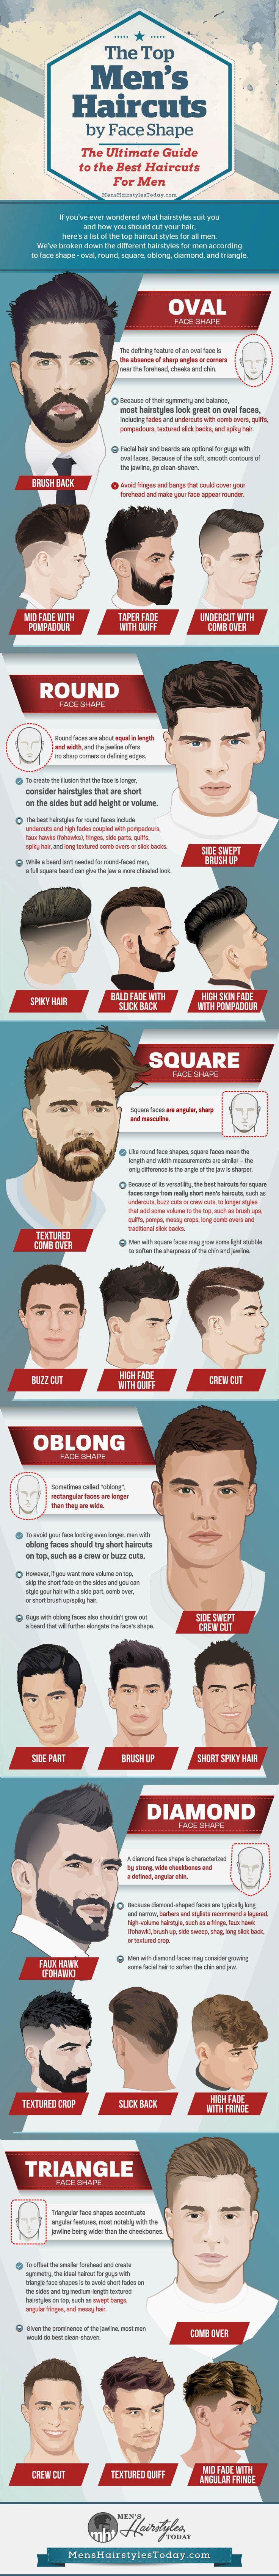 Haircut for men near me  best erkek moda images on pinterest  guy outfits male fashion